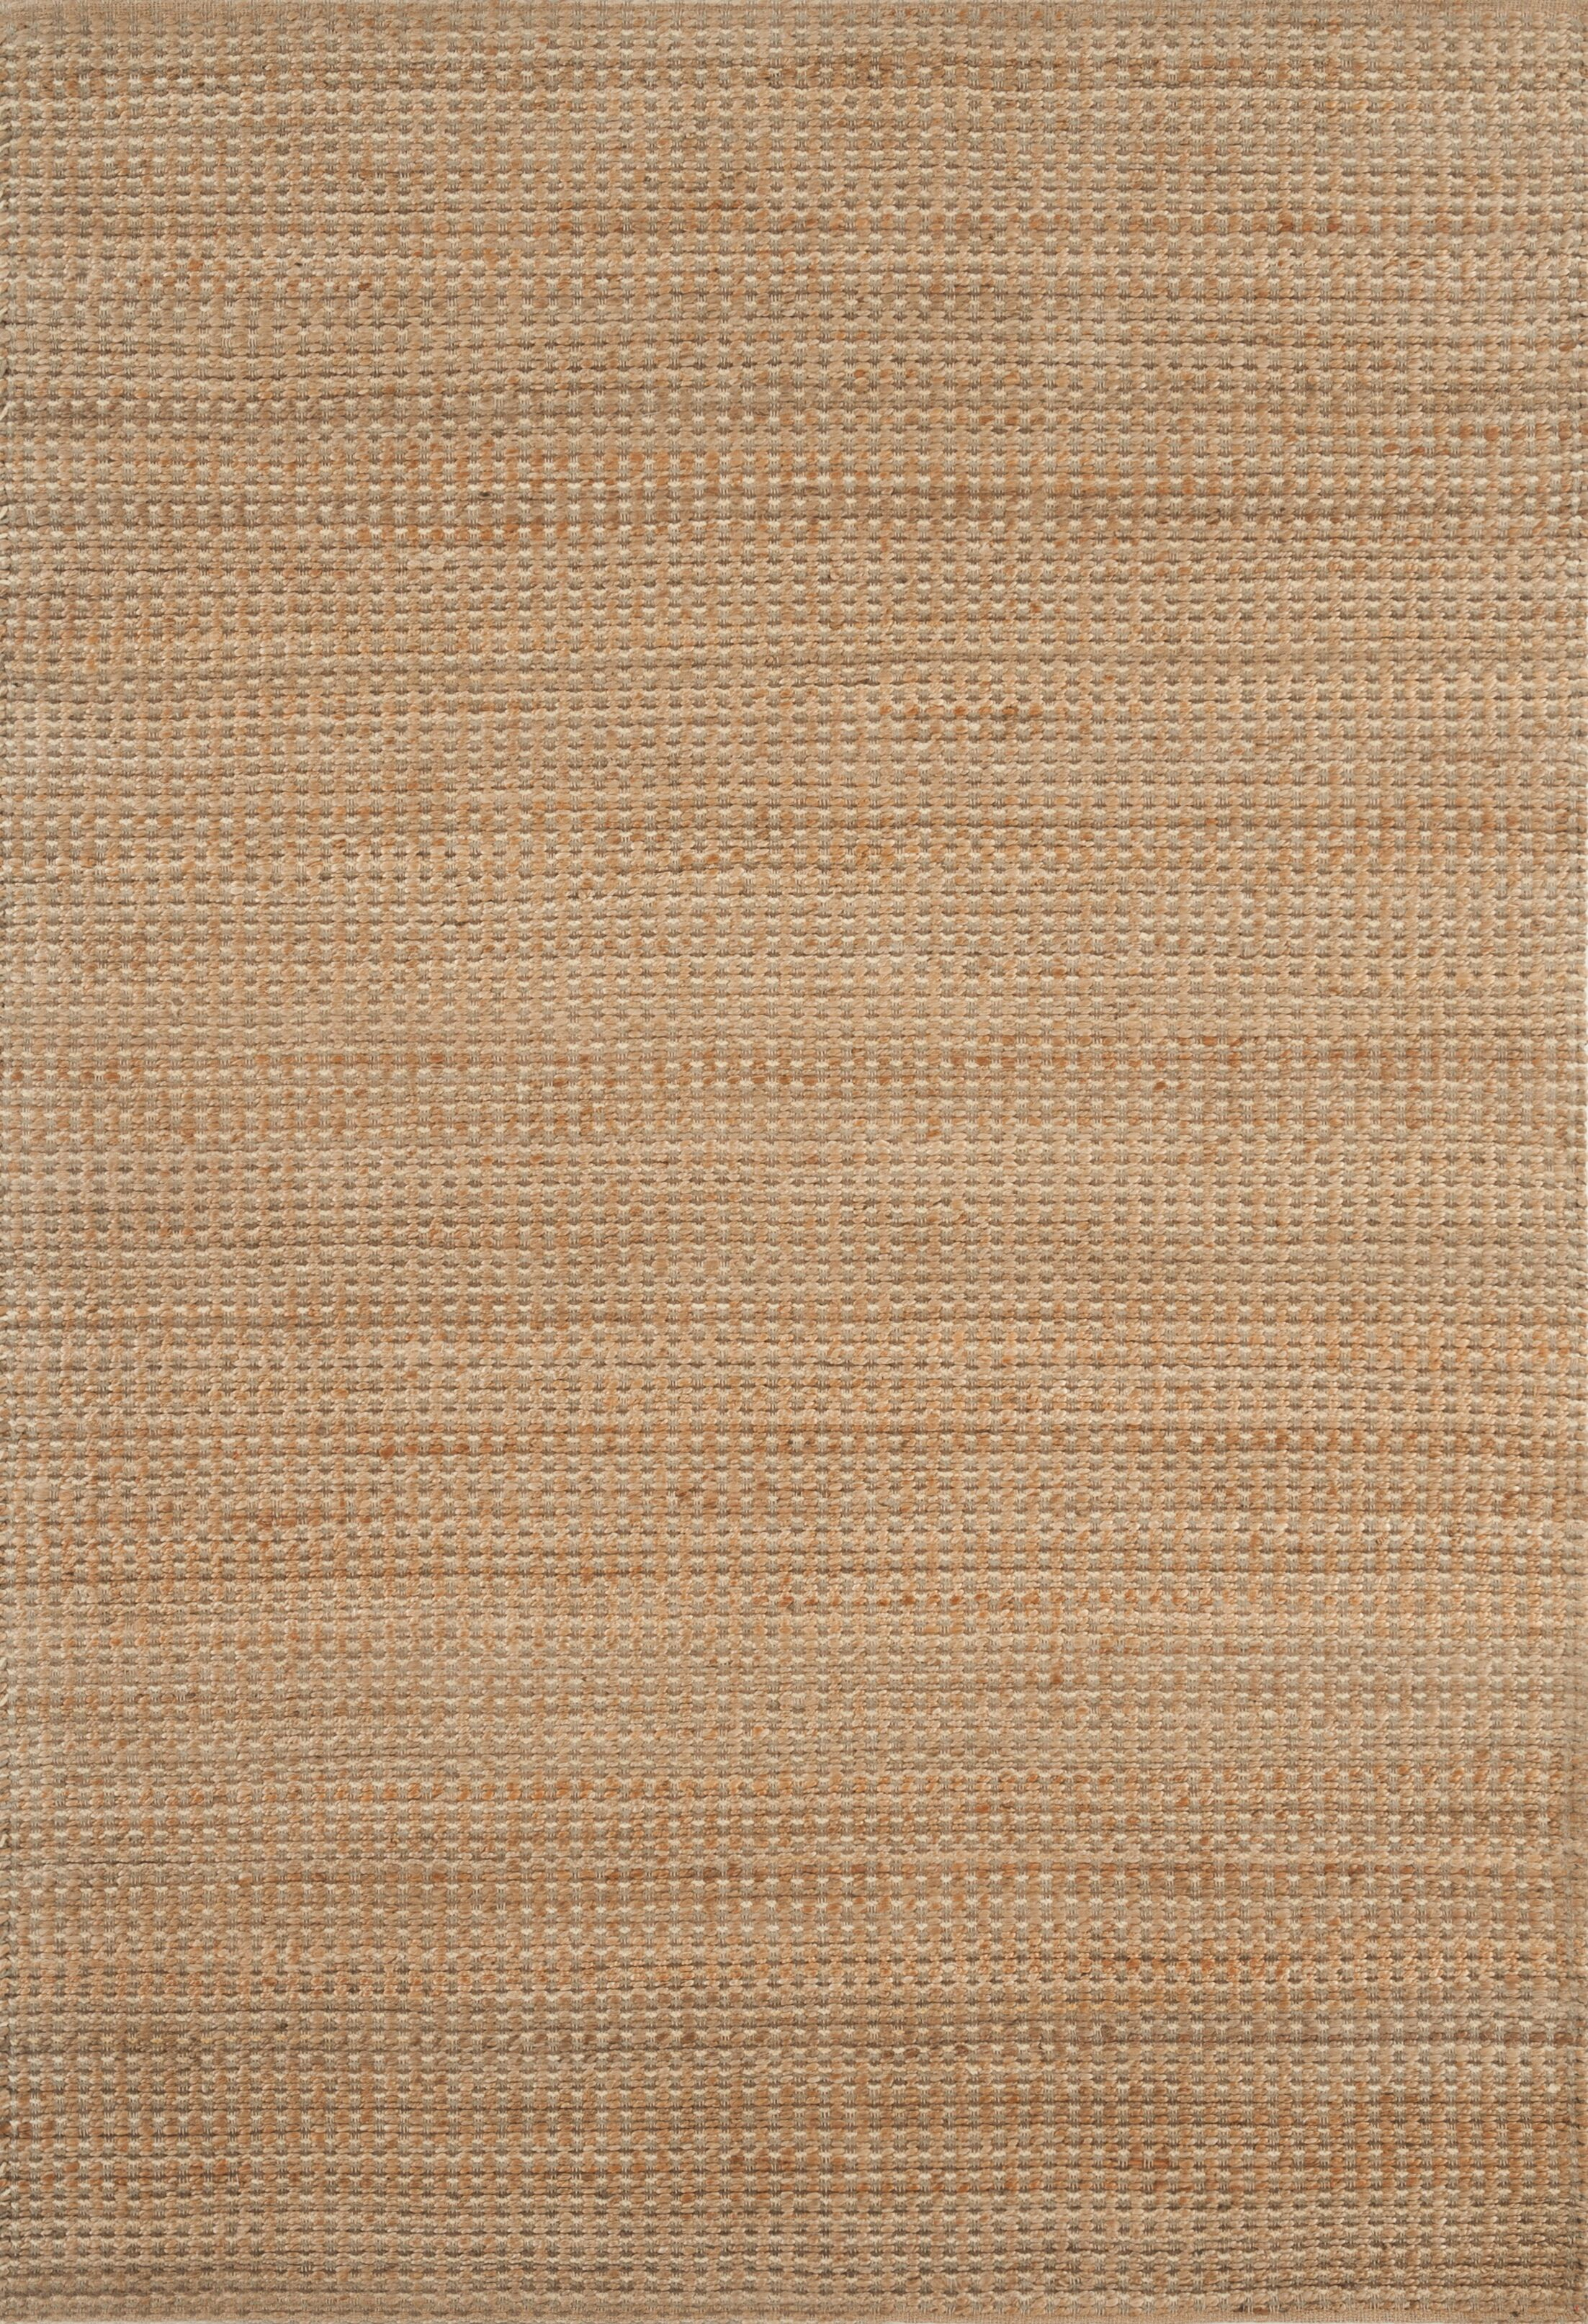 Jute Hand-Woven Tan Area Rug Rug Size: Rectangle 6'6